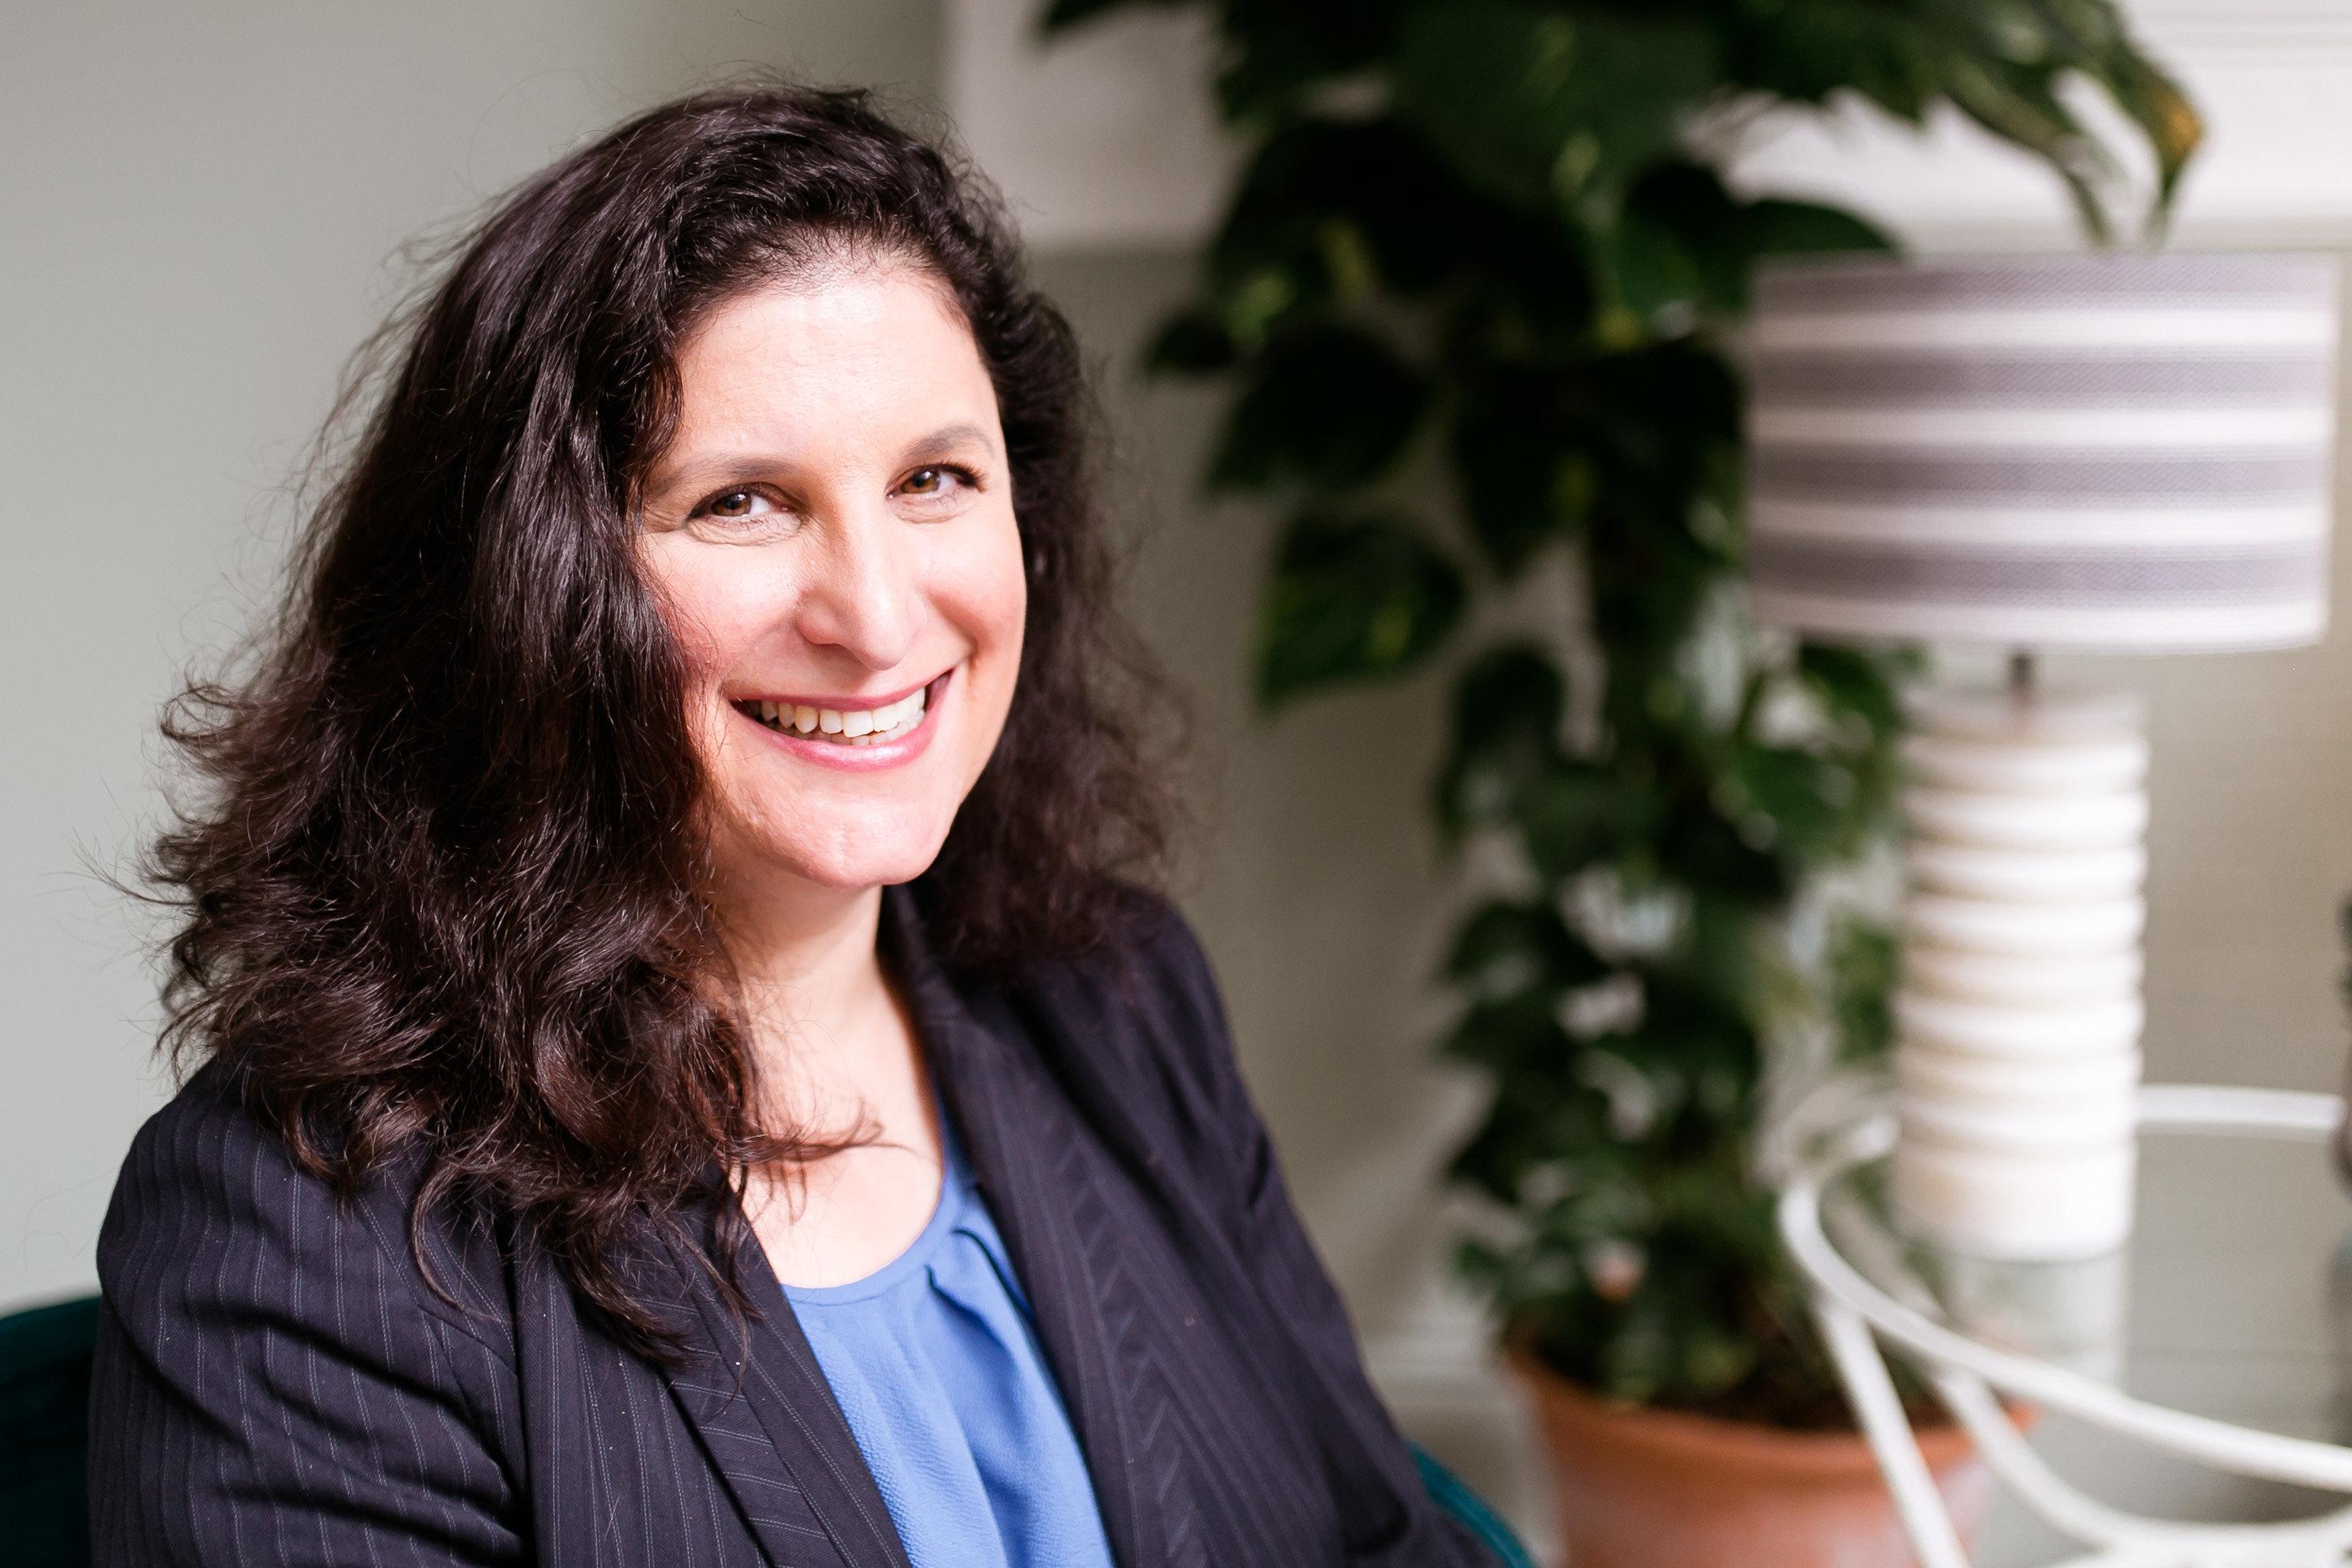 Felicia Myerowitz Singh